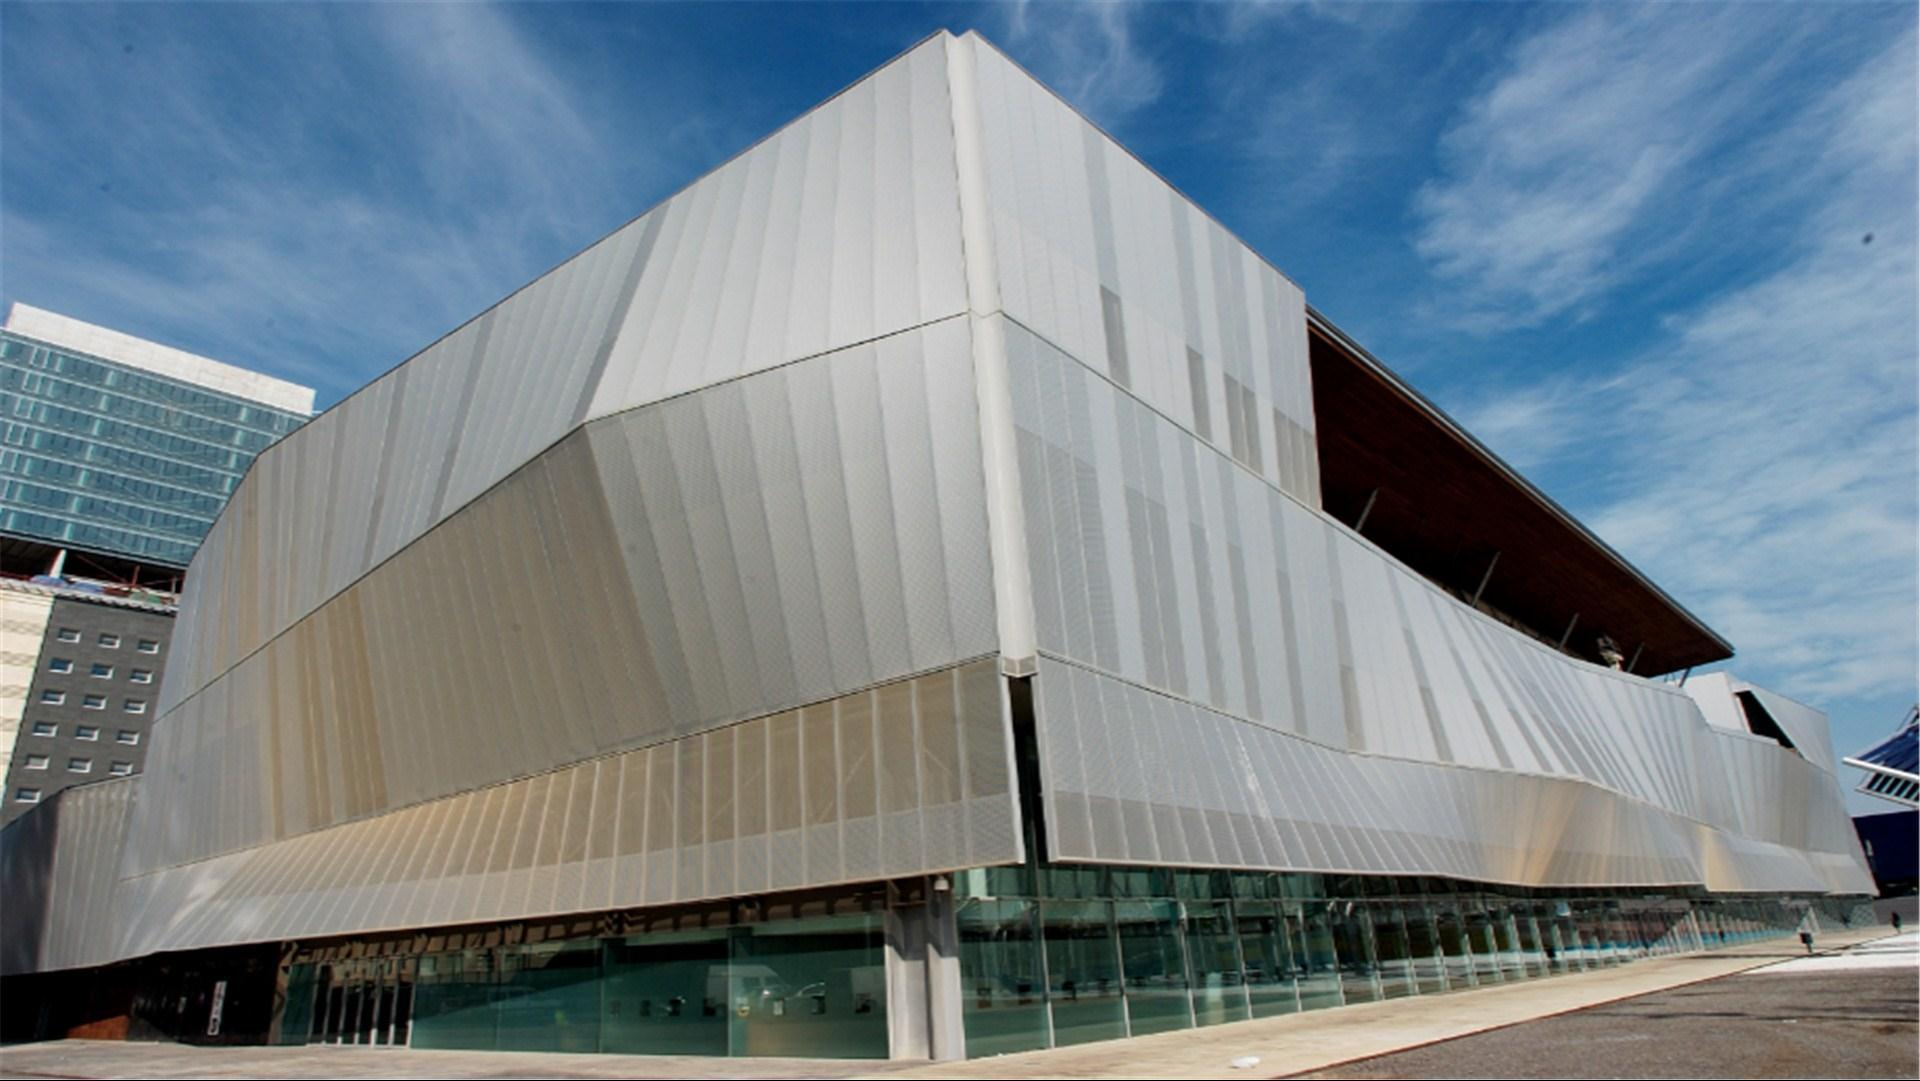 Barcelona Convention Center